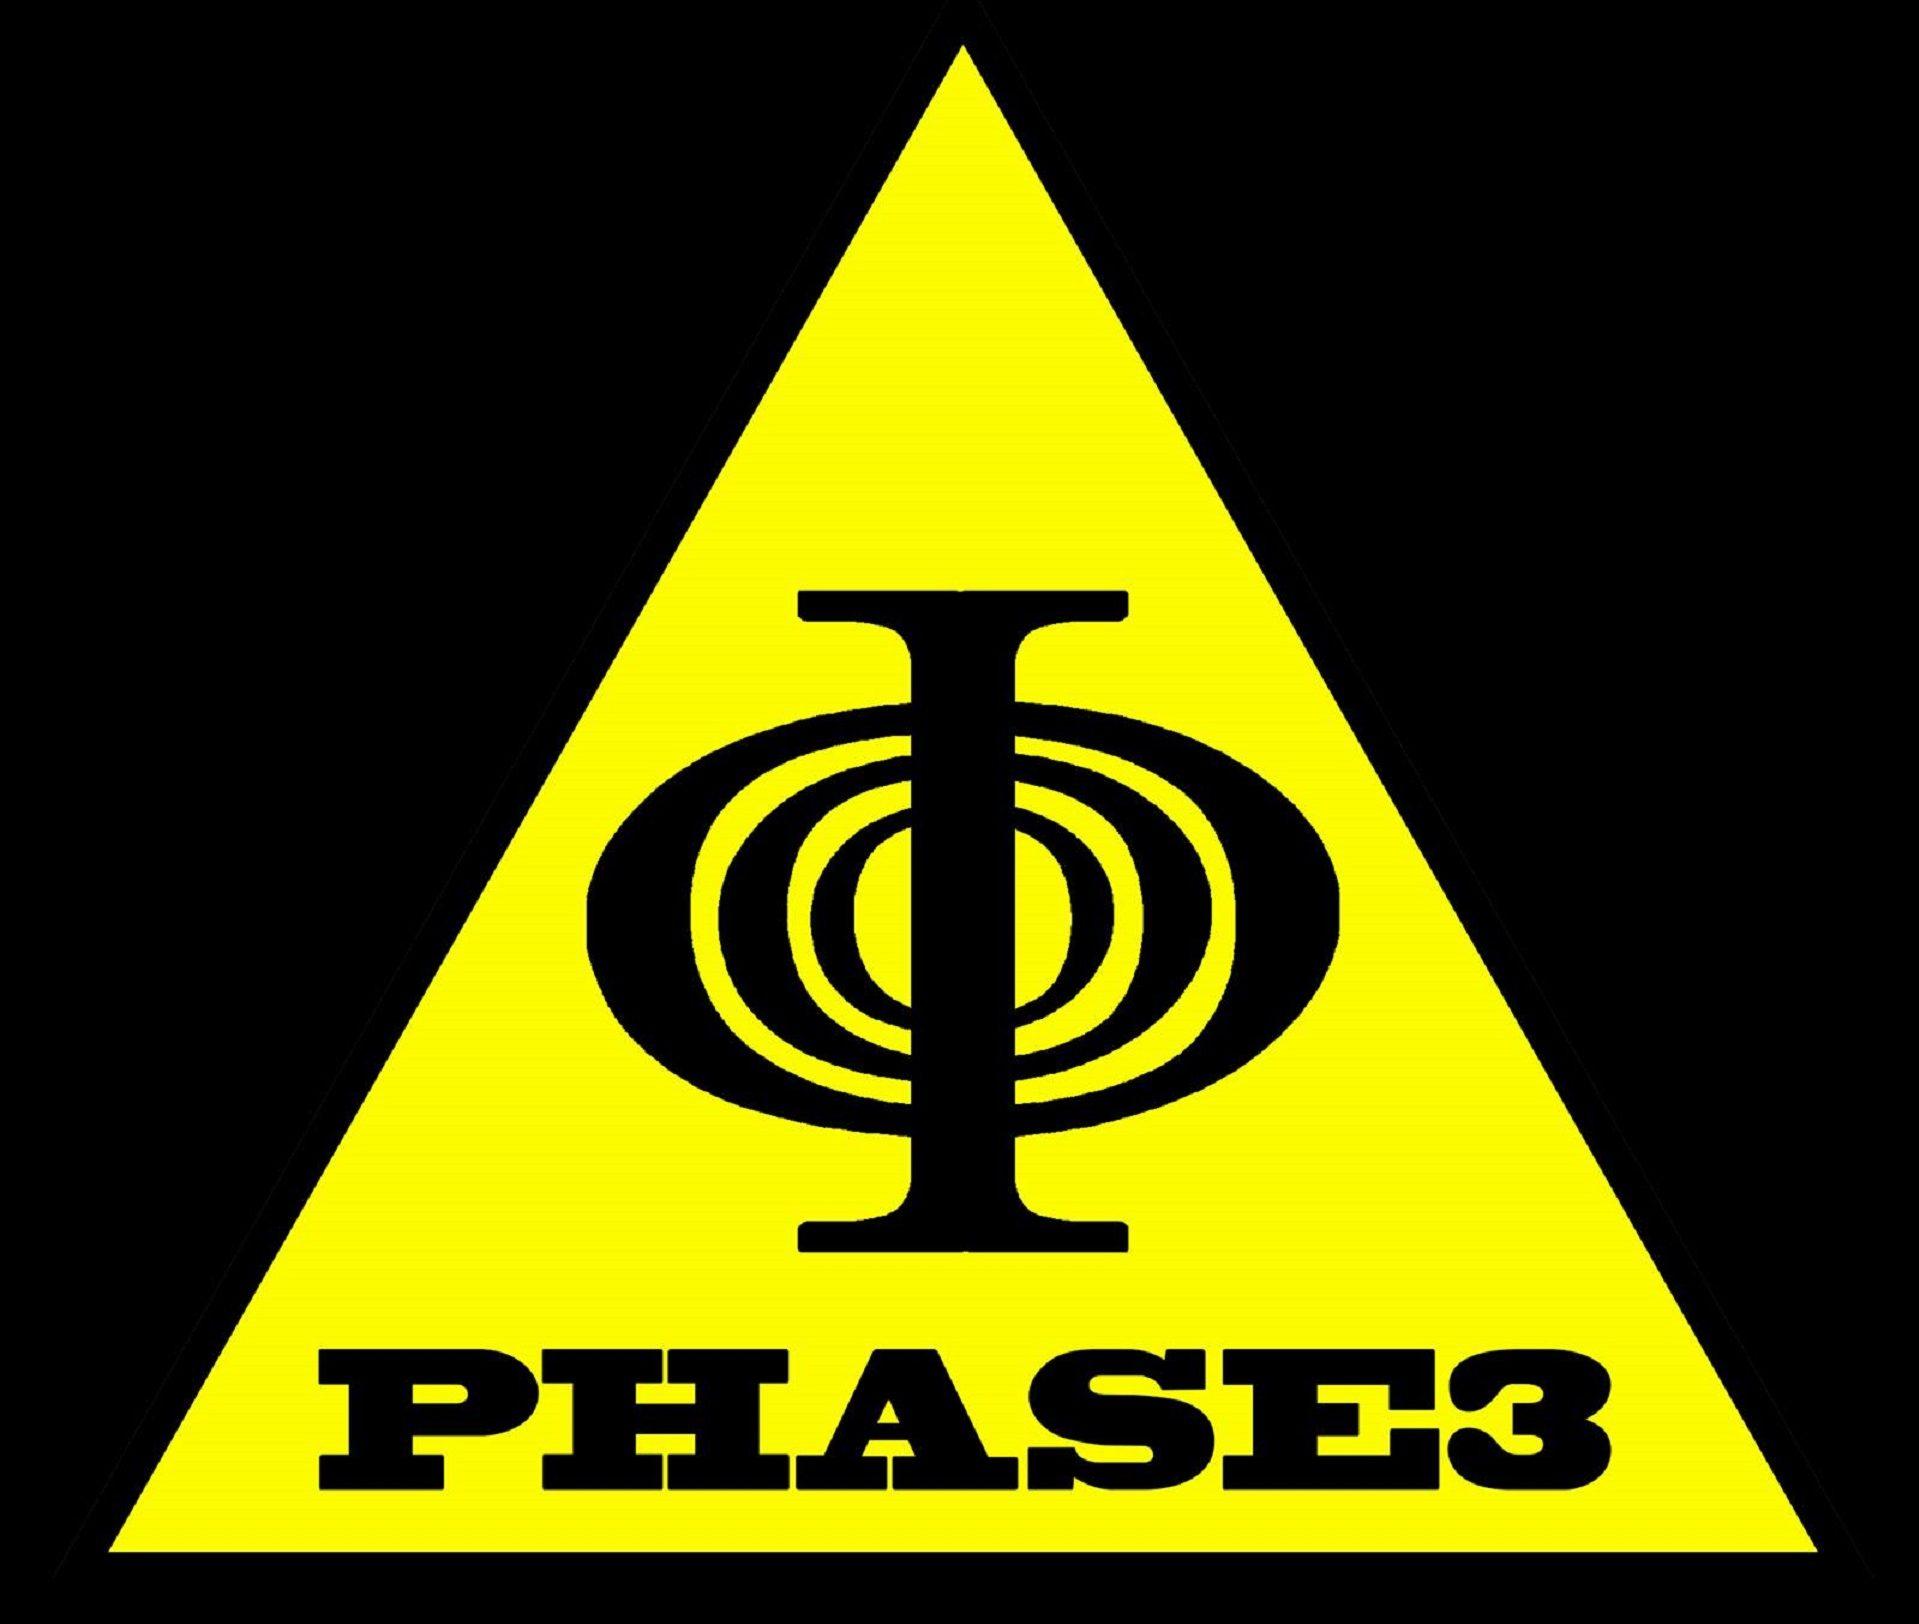 ThePhase3.com